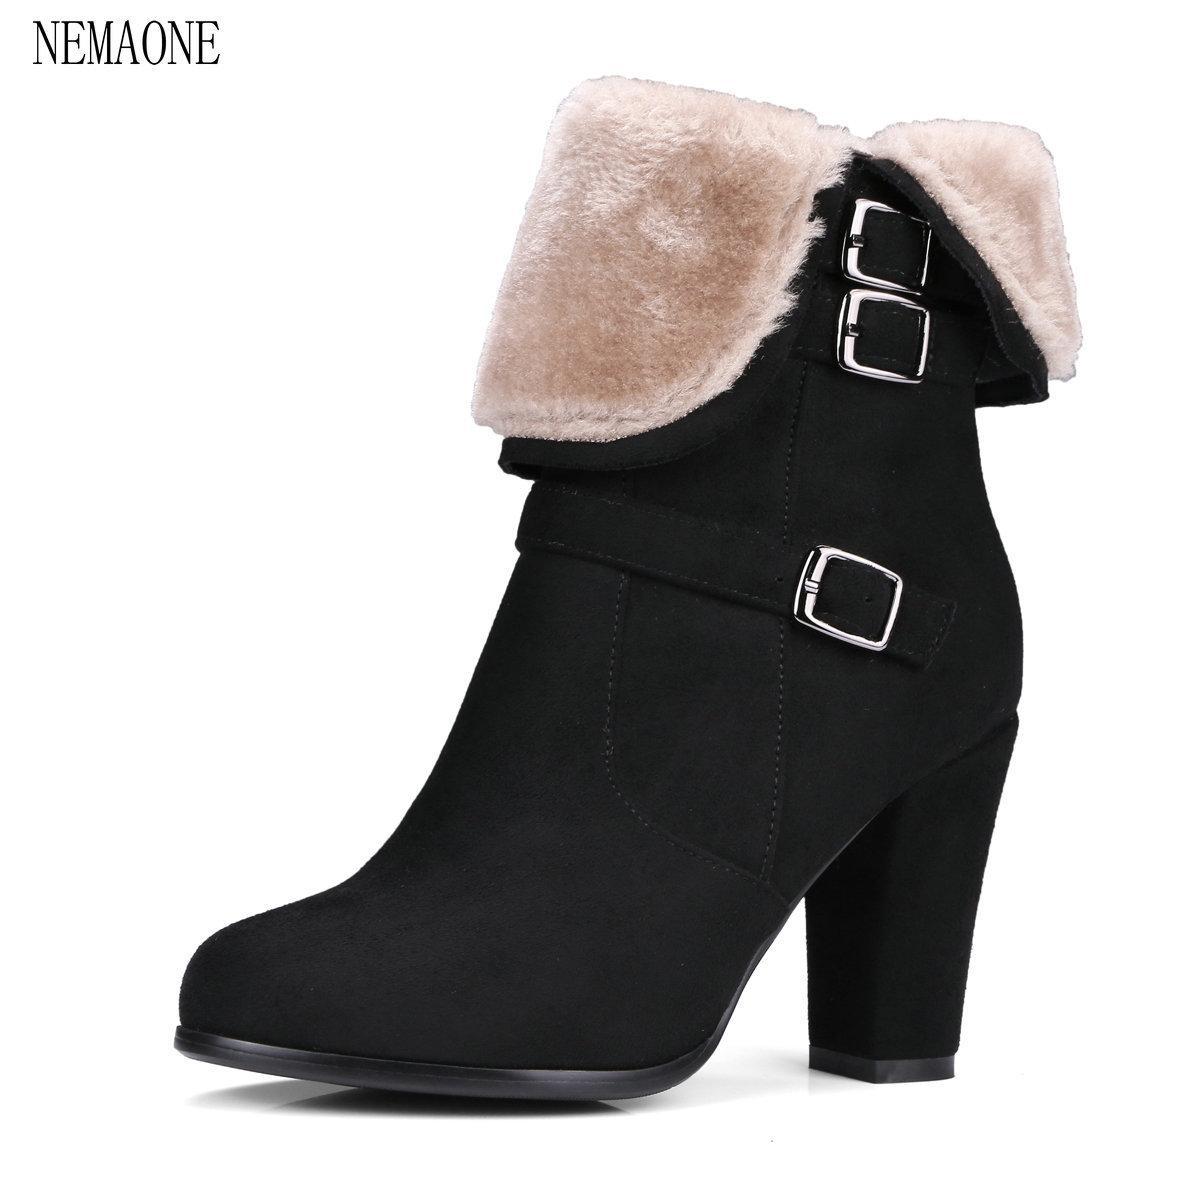 NEMAONE Winter Damens Round Round Damens Toe Ankle Stiefel High Heels Schuhes Double 70e44c